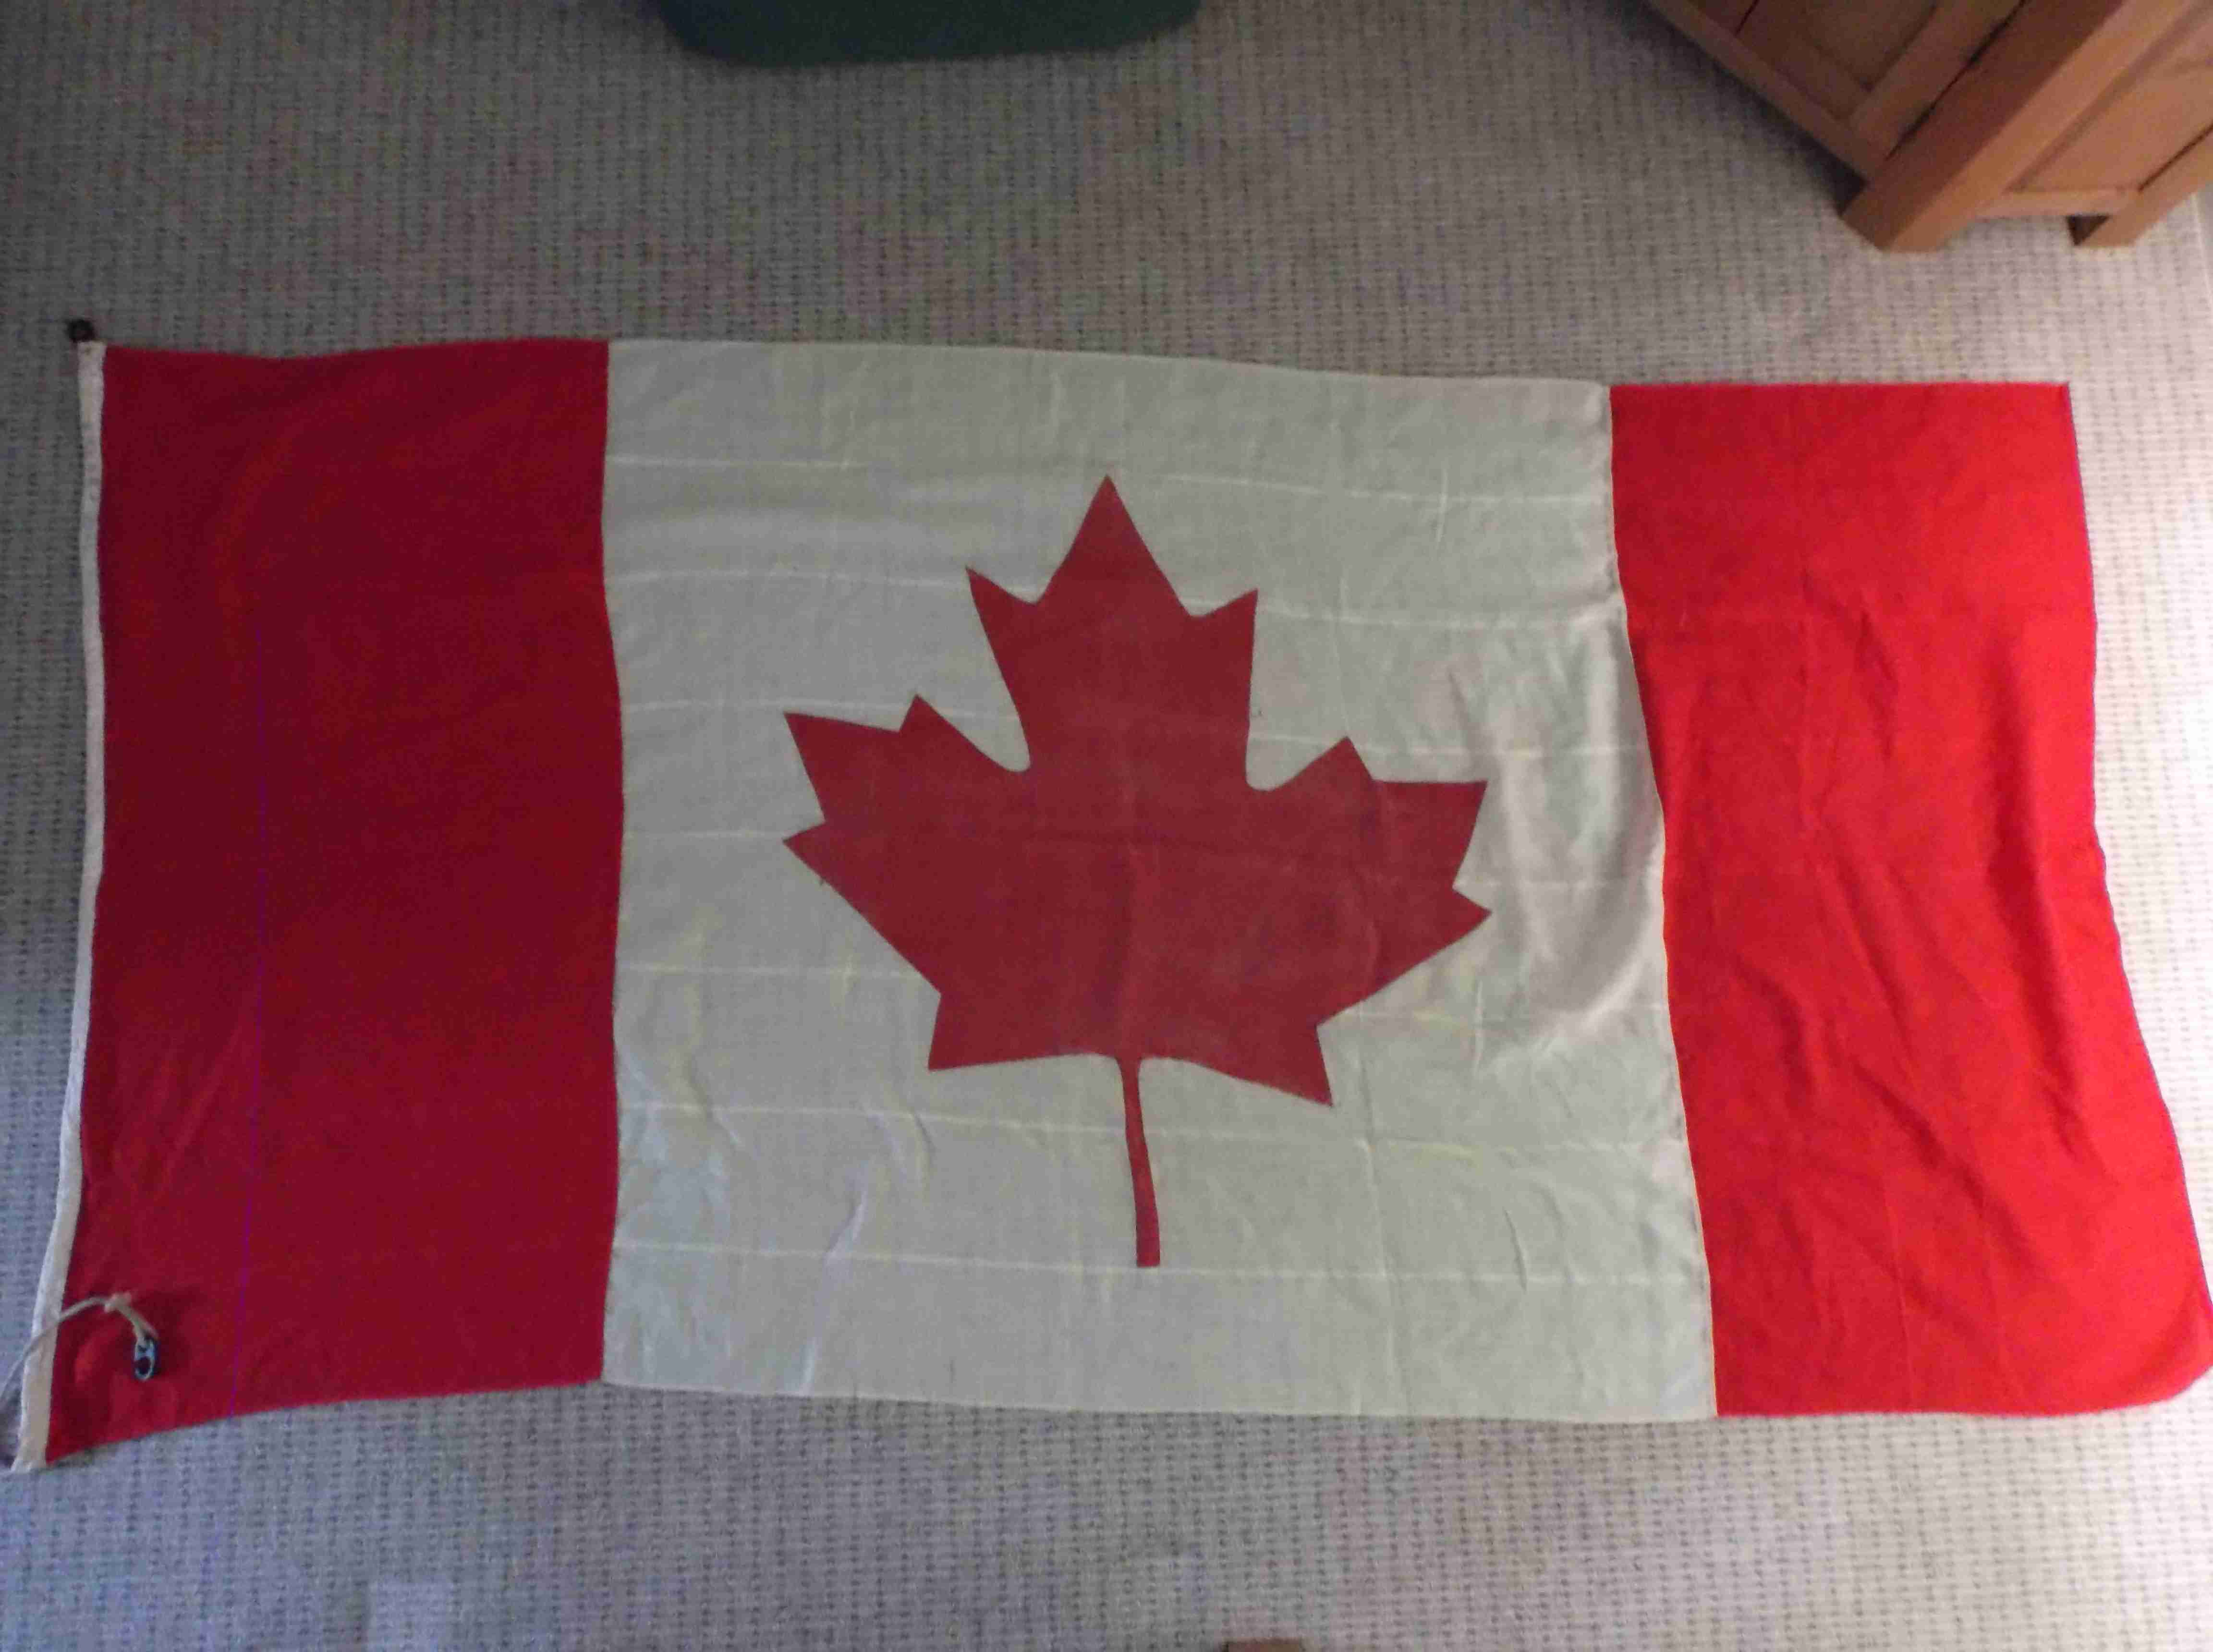 CANADIAN MERCHANT SHIPPING COMPANY HOUSEFLAG